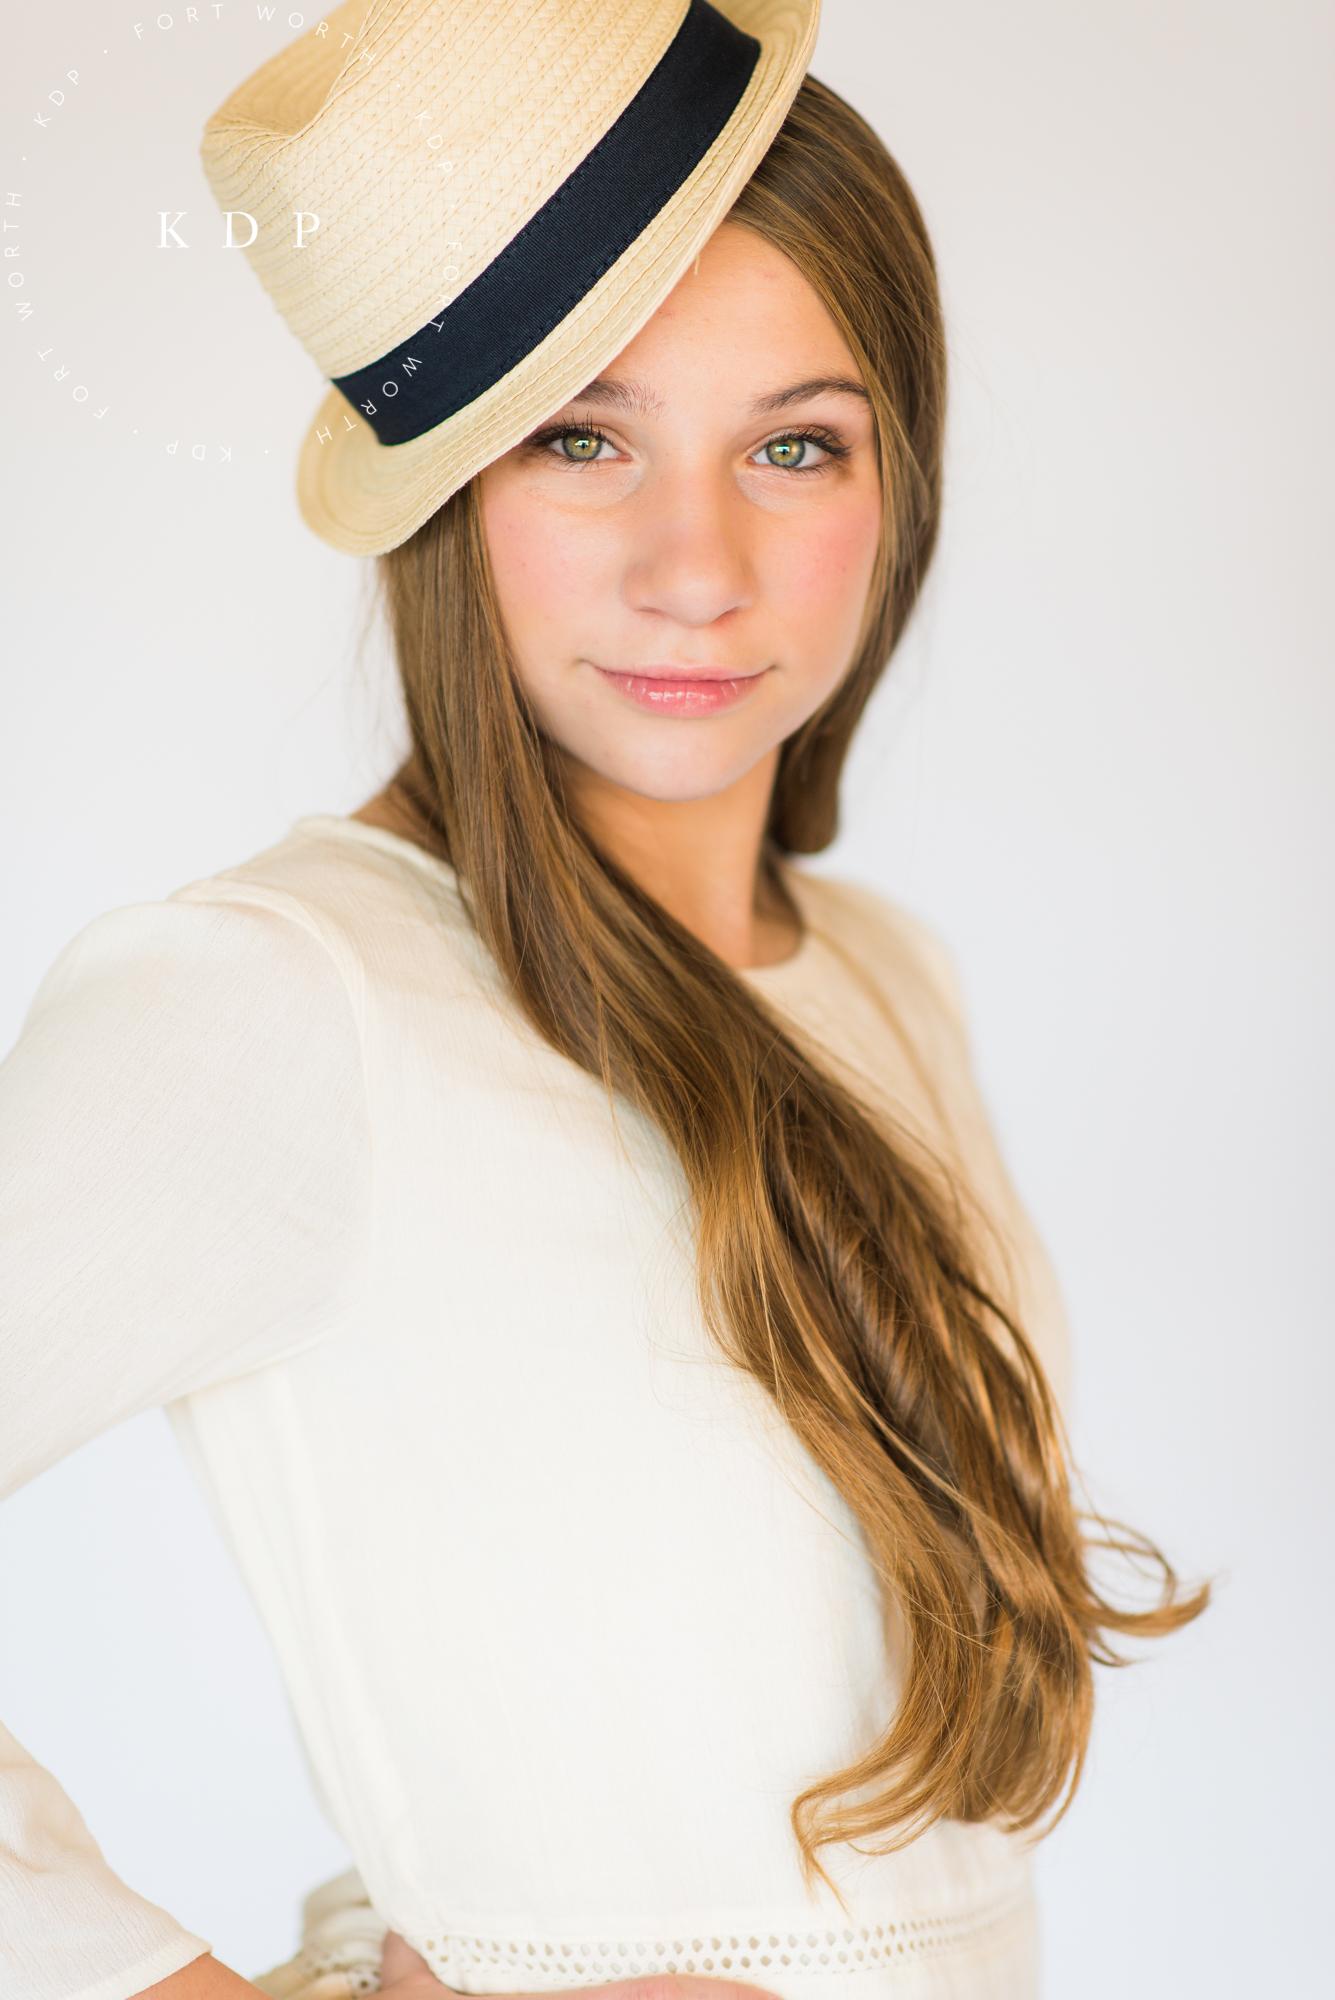 kimberly-danielle-portraits-tweens-model-session-63.jpg